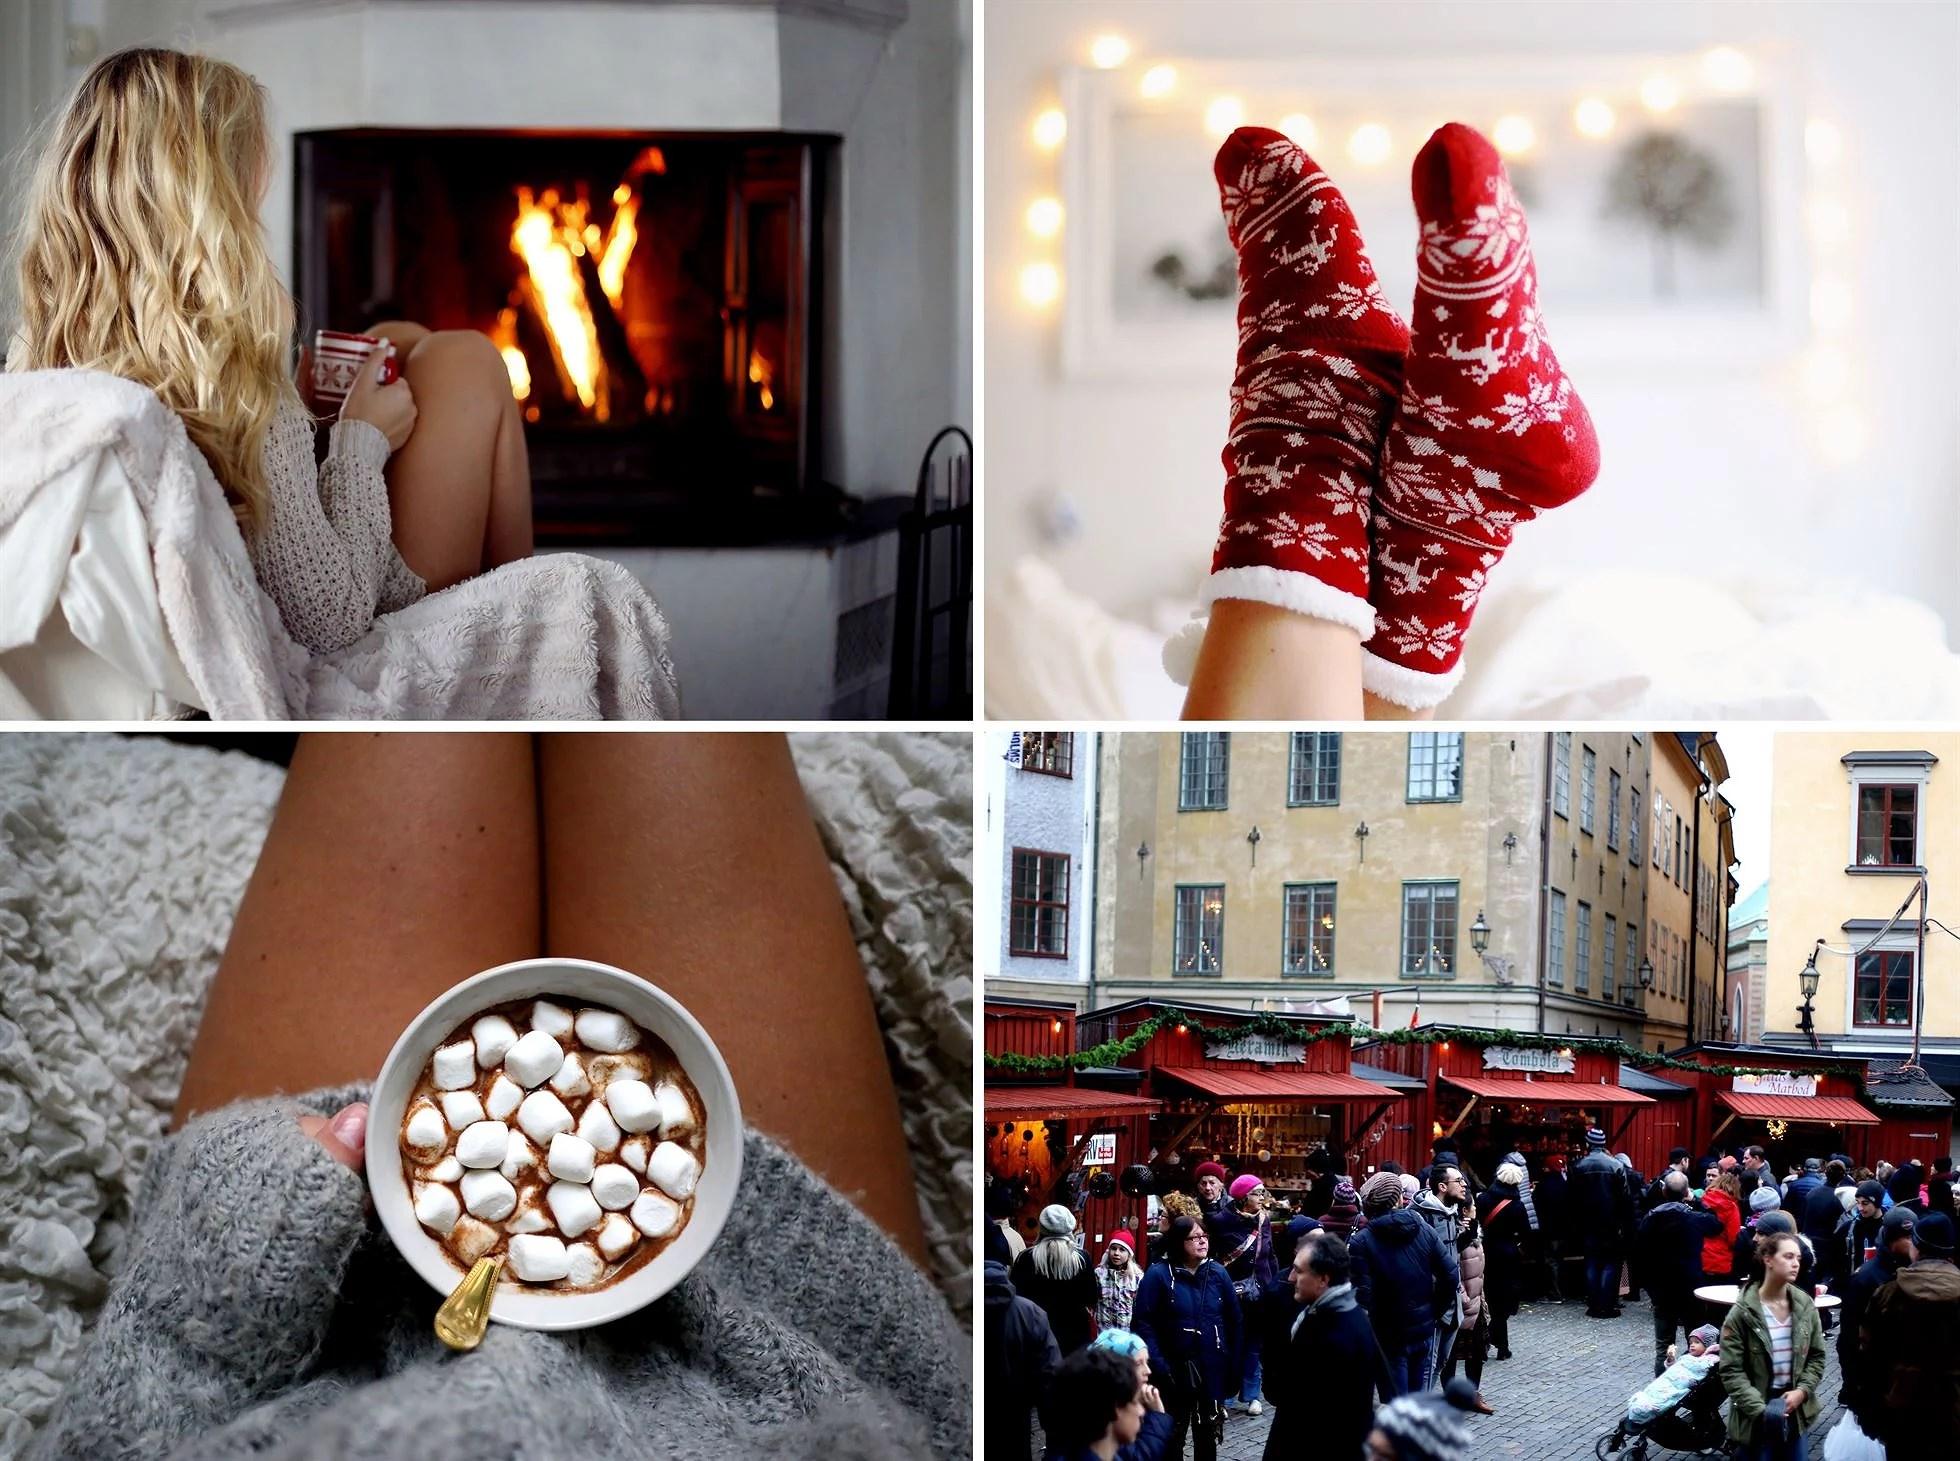 Vardagsbilder höst & vinter 201412